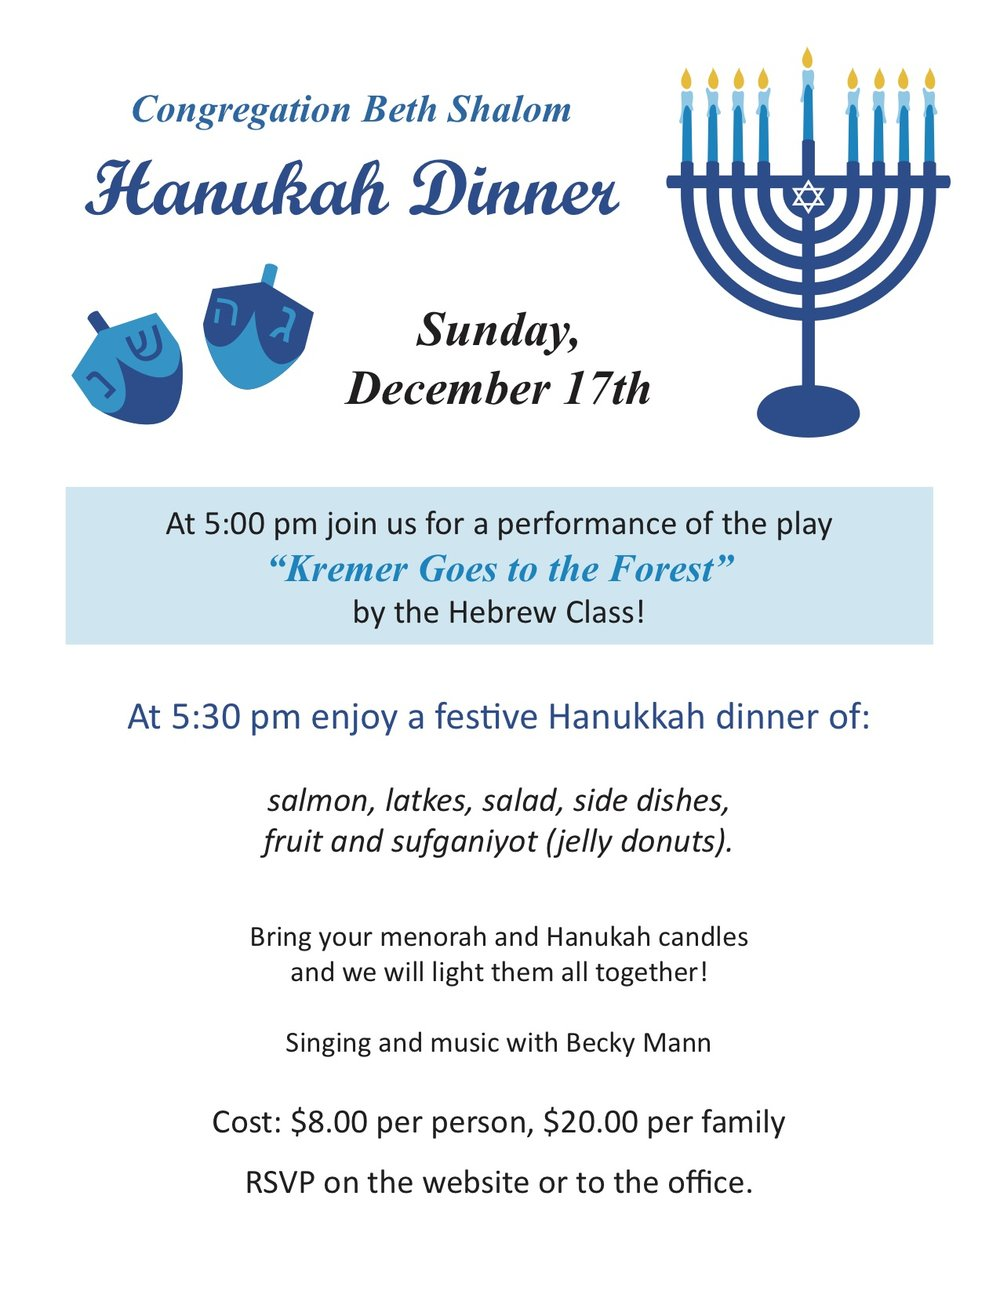 Hanukkah Dinner2 (5).jpg